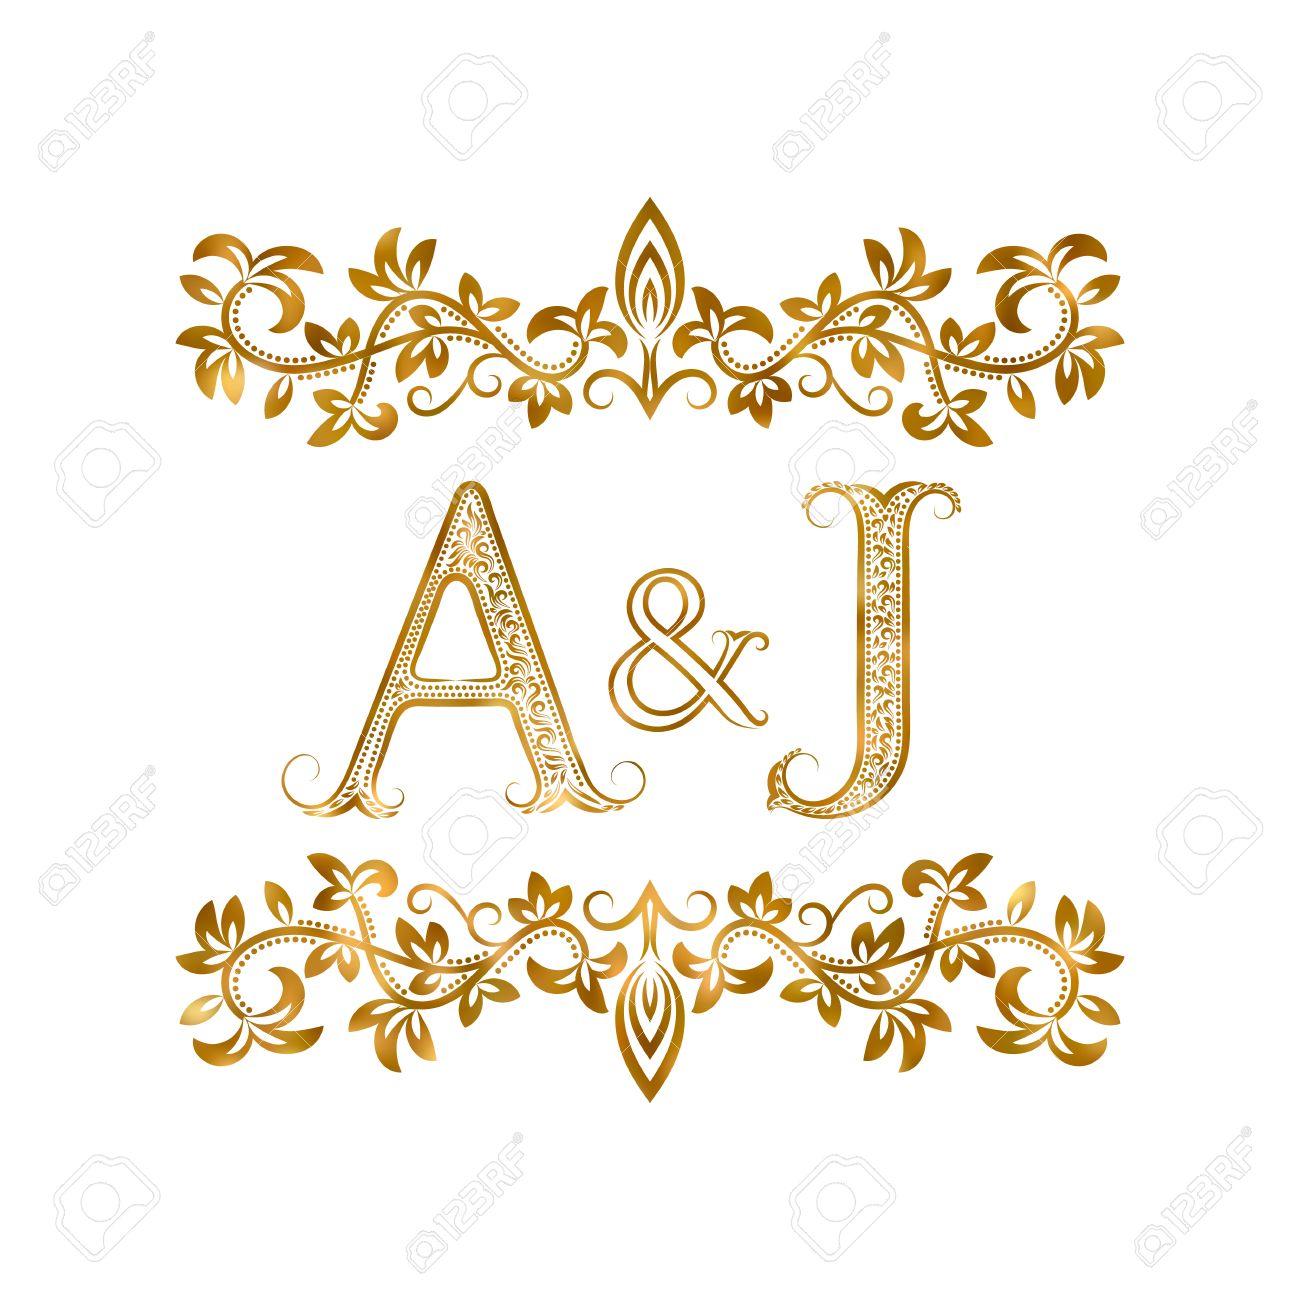 A J Vintage Initials Symbol Letters A J Ampersand Surrounded